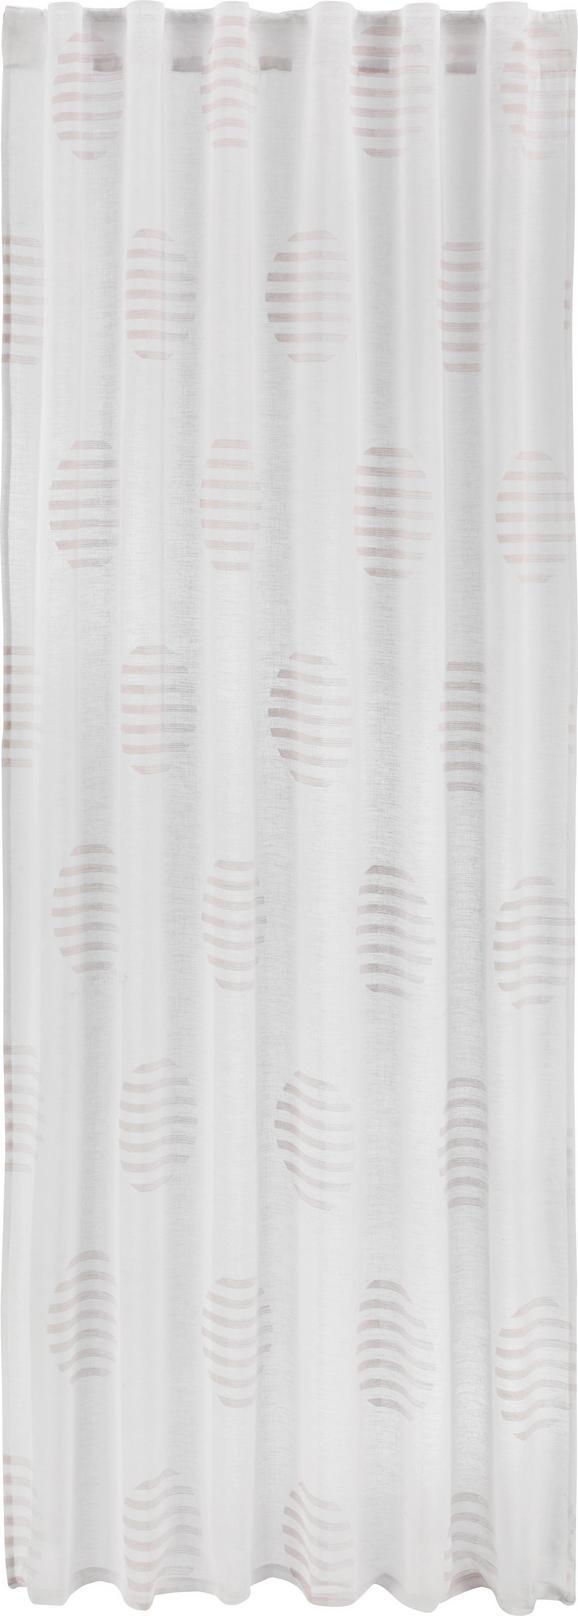 Zavesa Z Zankami Josephine - roza/bela, Konvencionalno, tekstil (140/245cm) - Mömax modern living